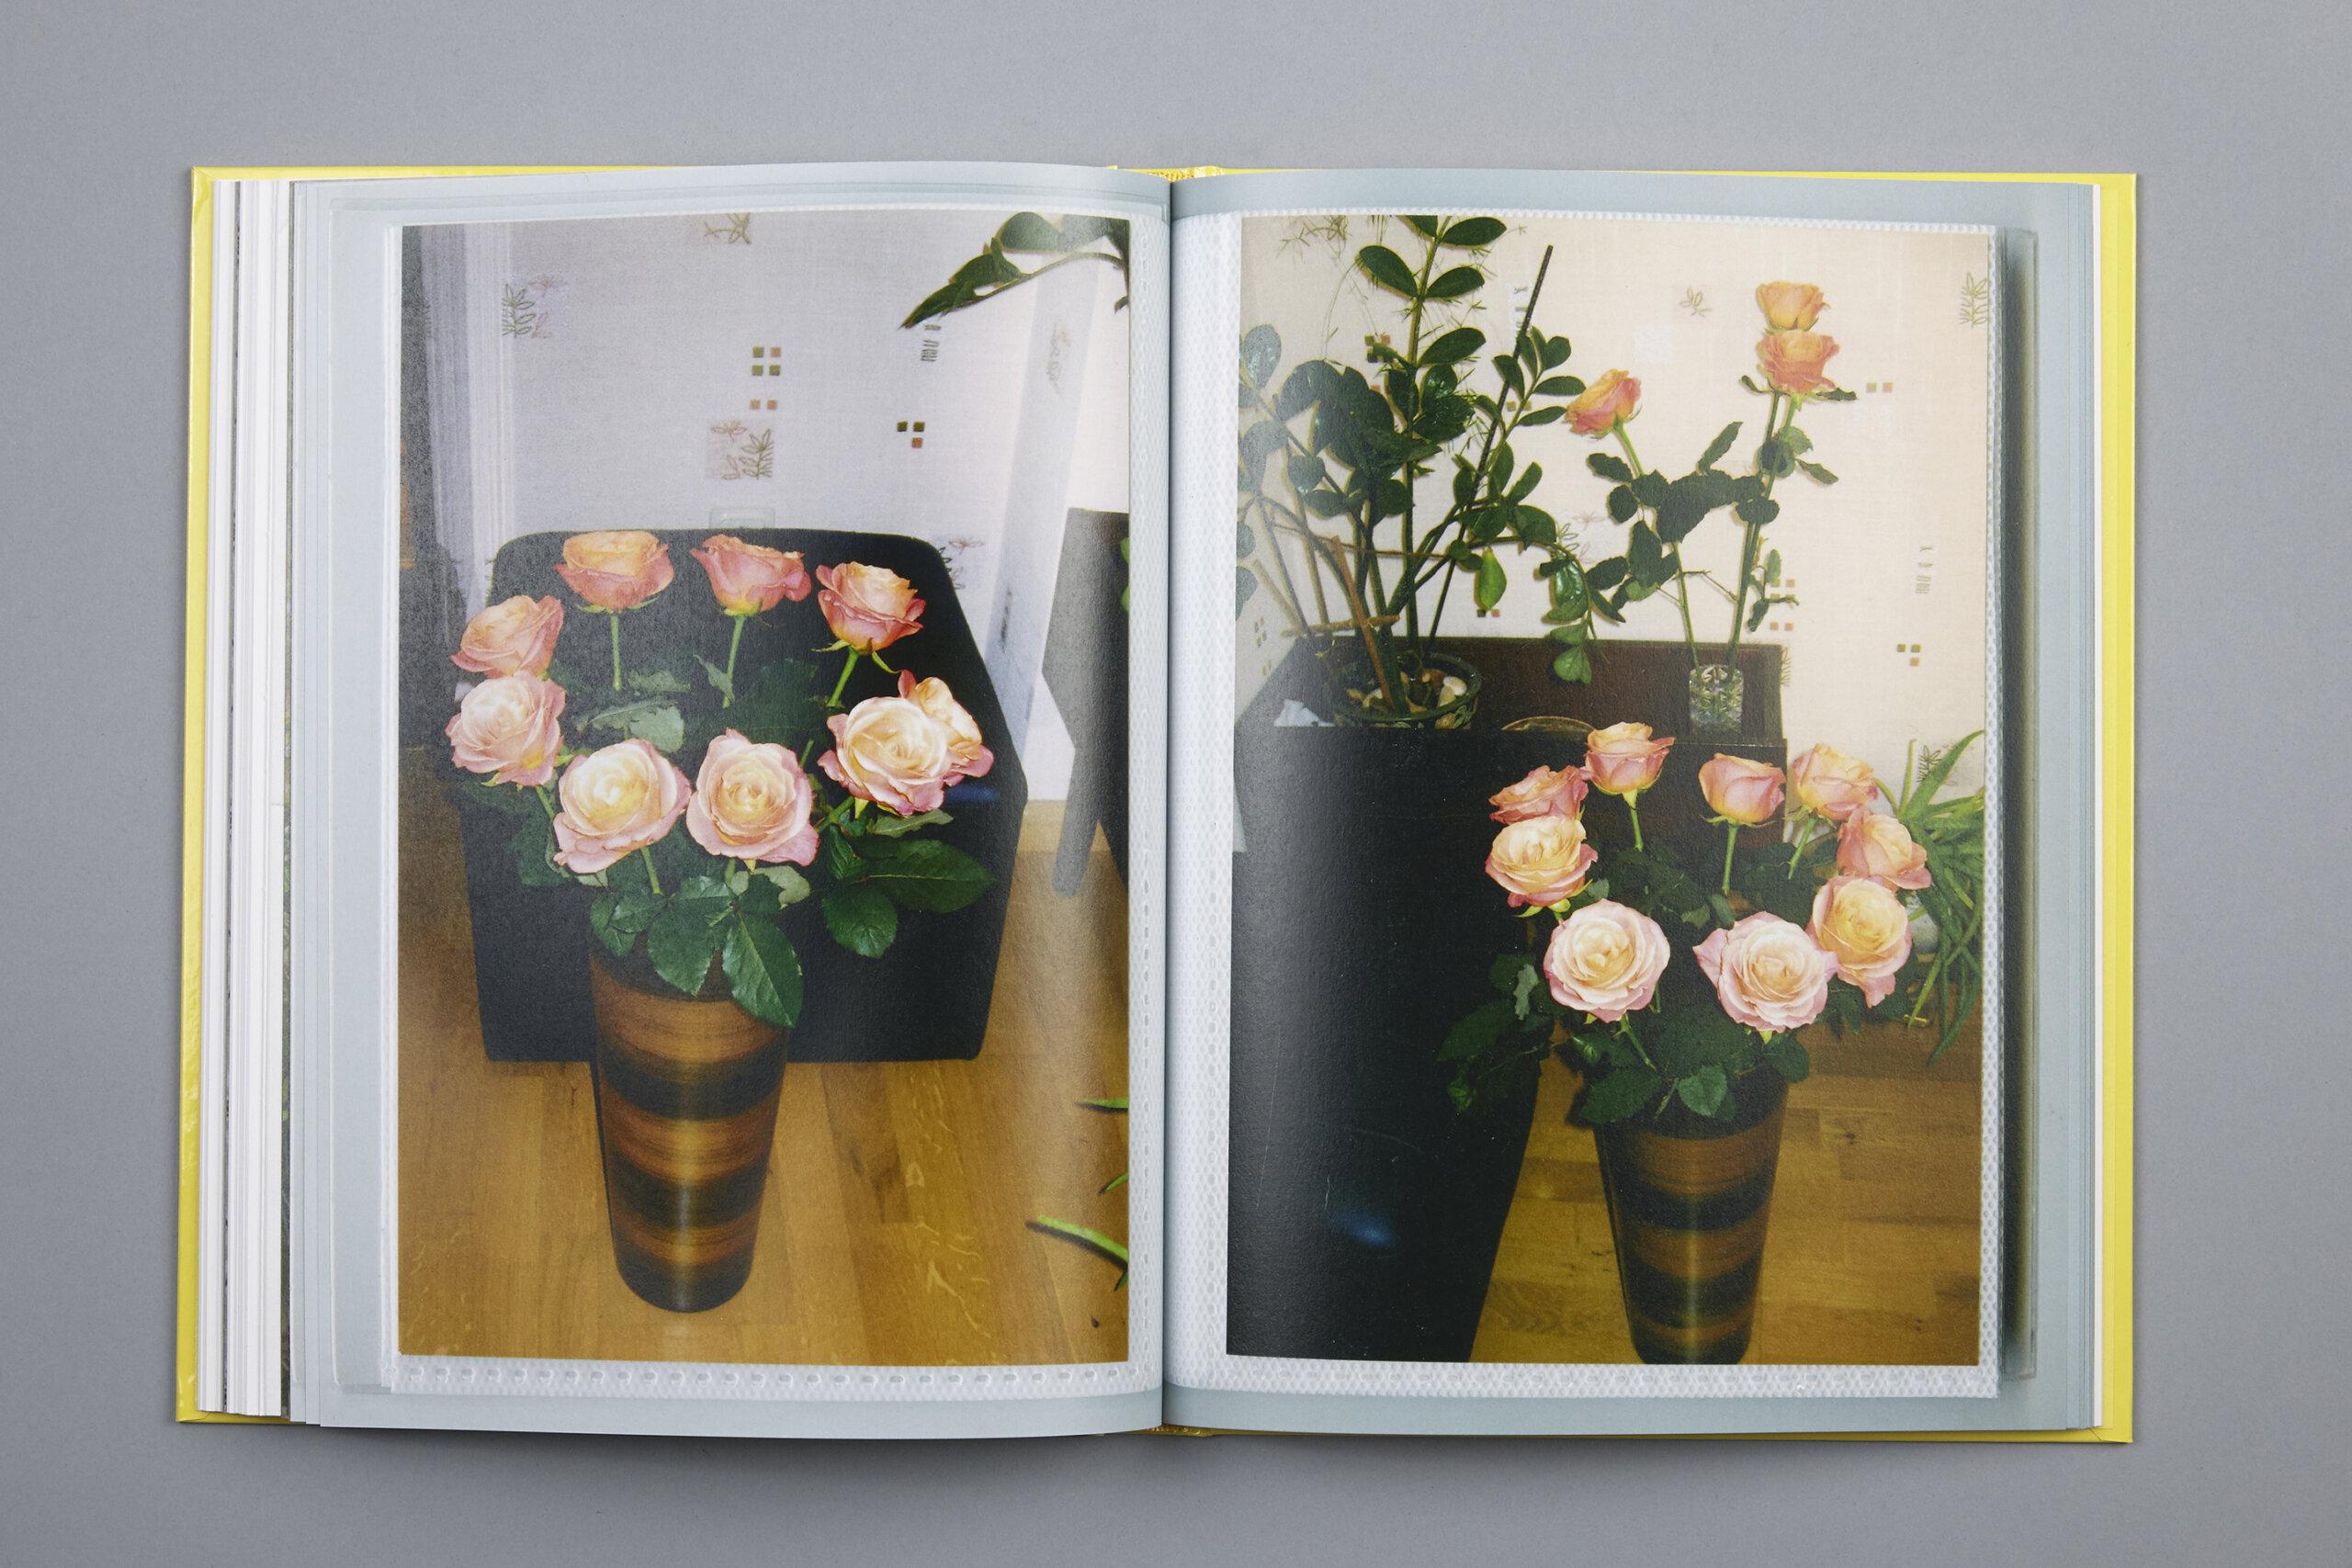 tamane-flower-smuggler-delpire-co-4